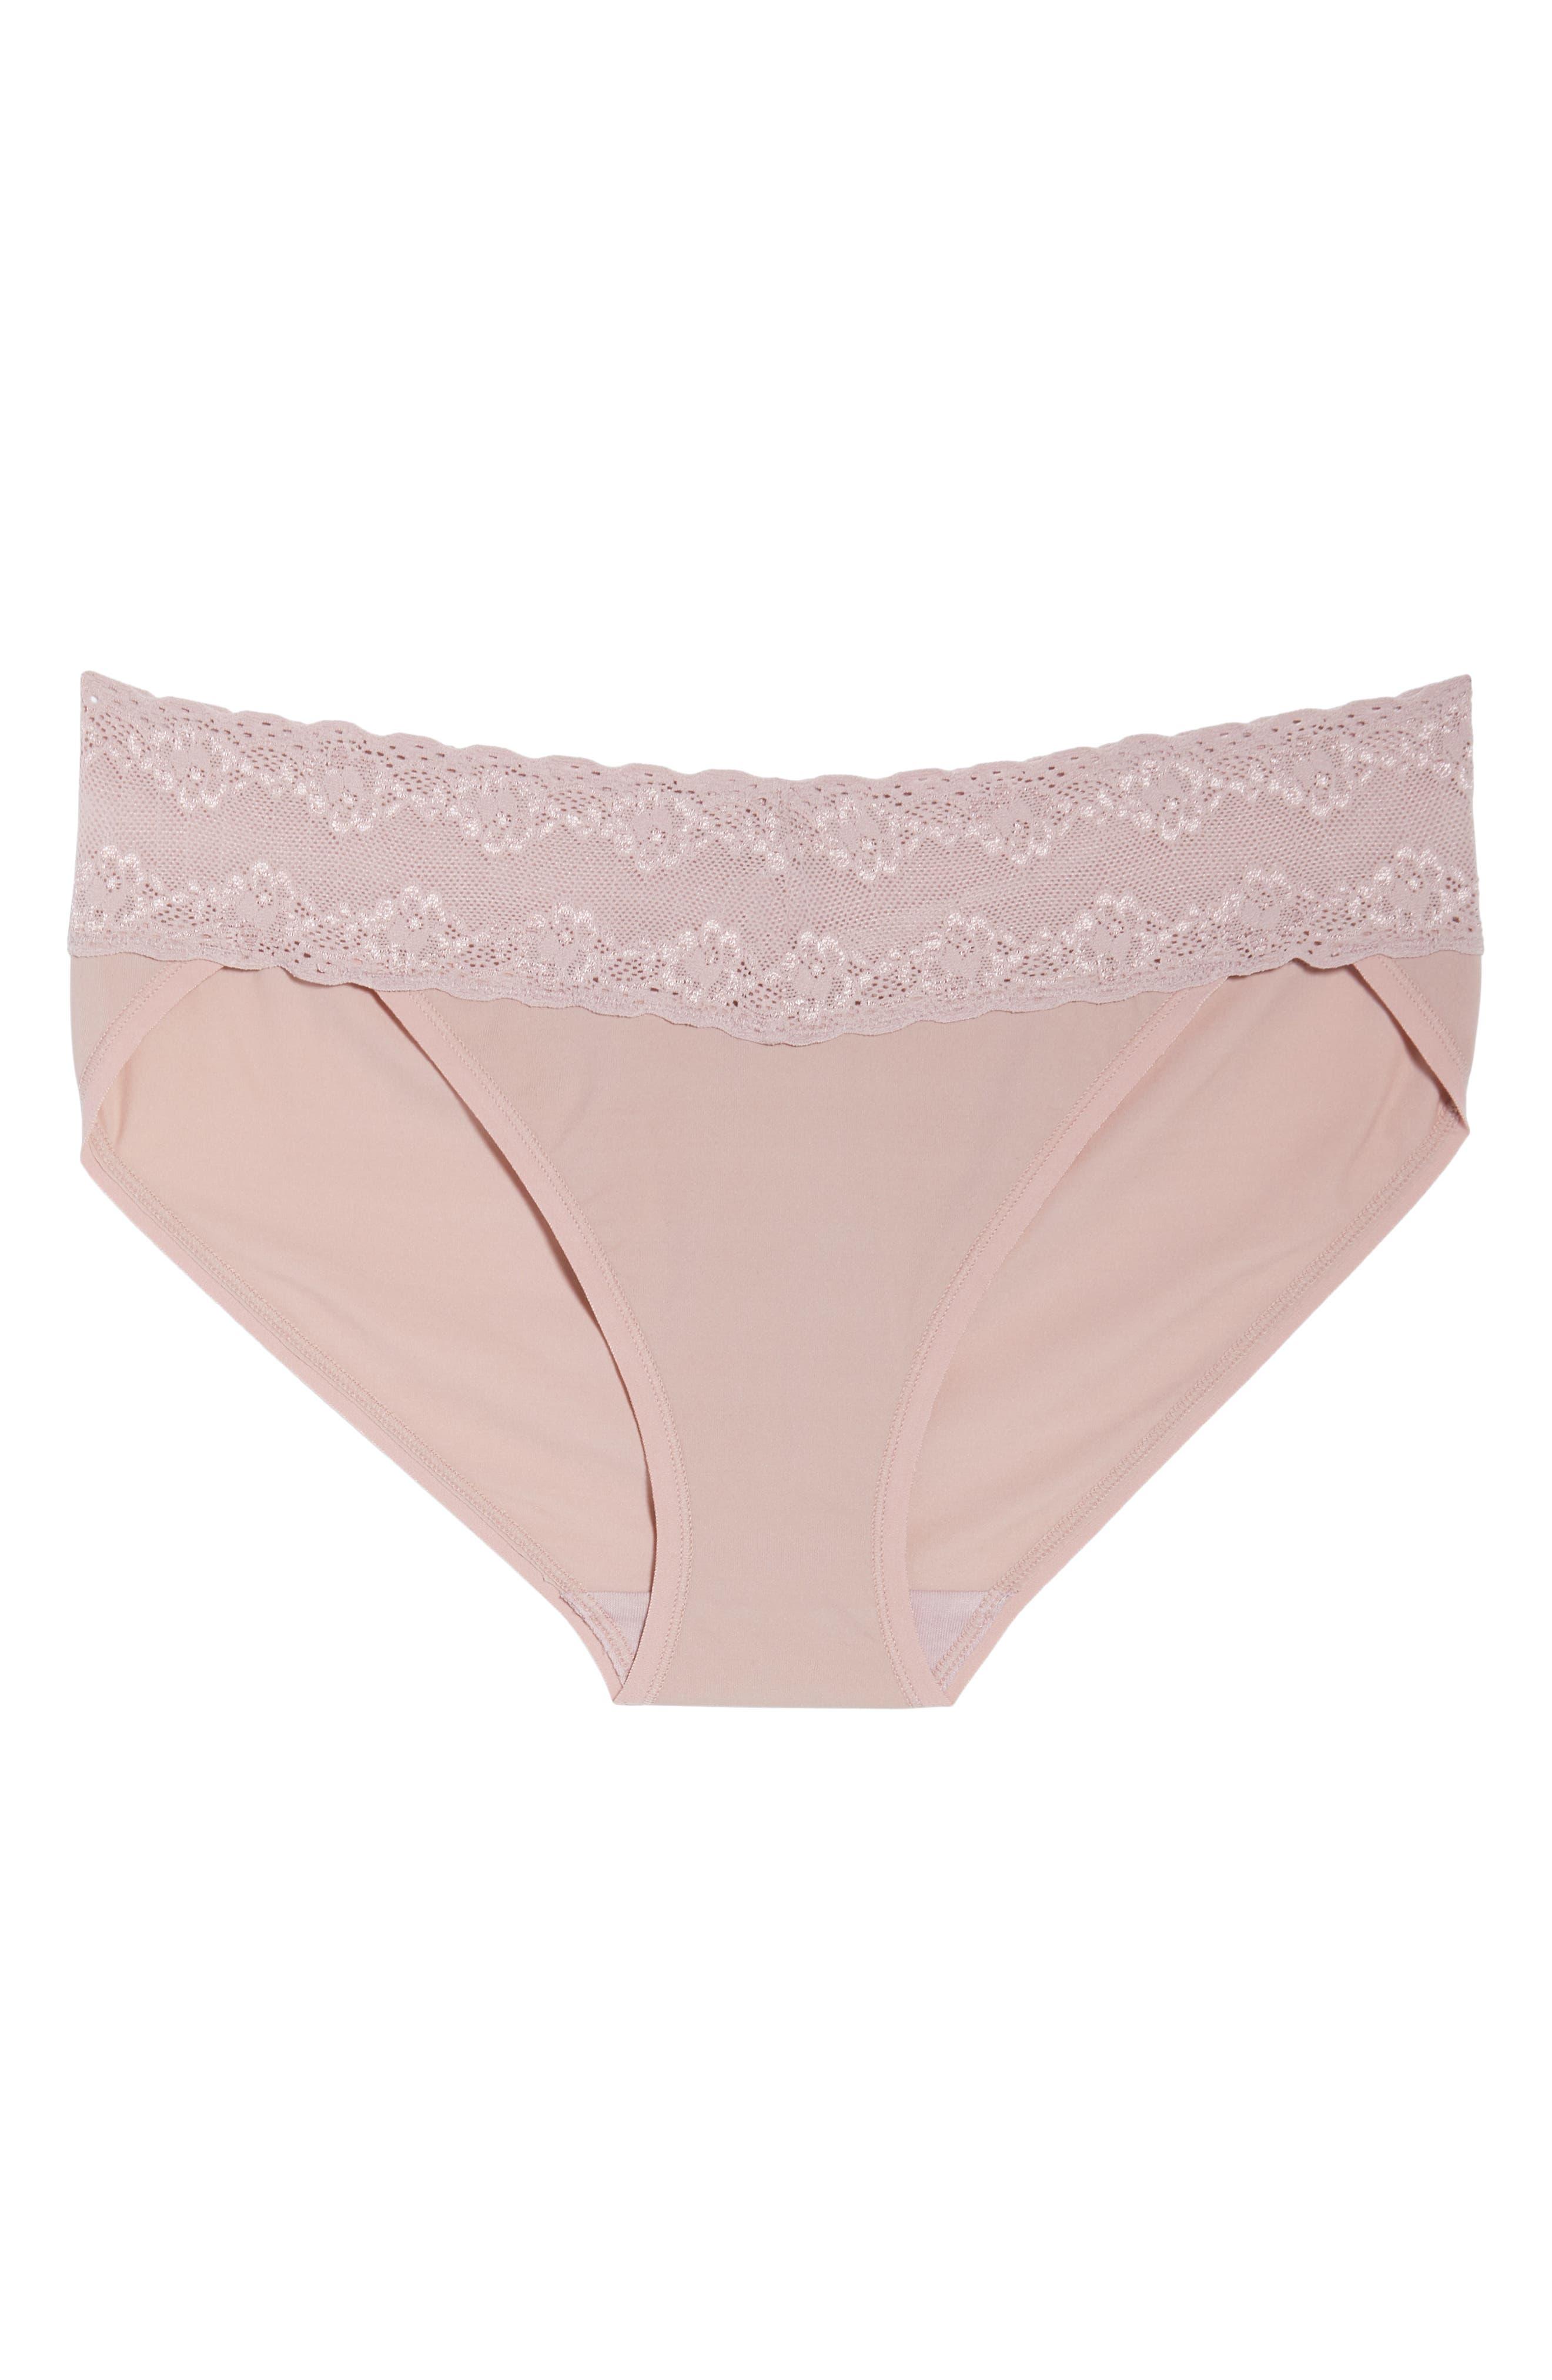 Natori Bliss Perfection Bikini (Any 3 for $40)